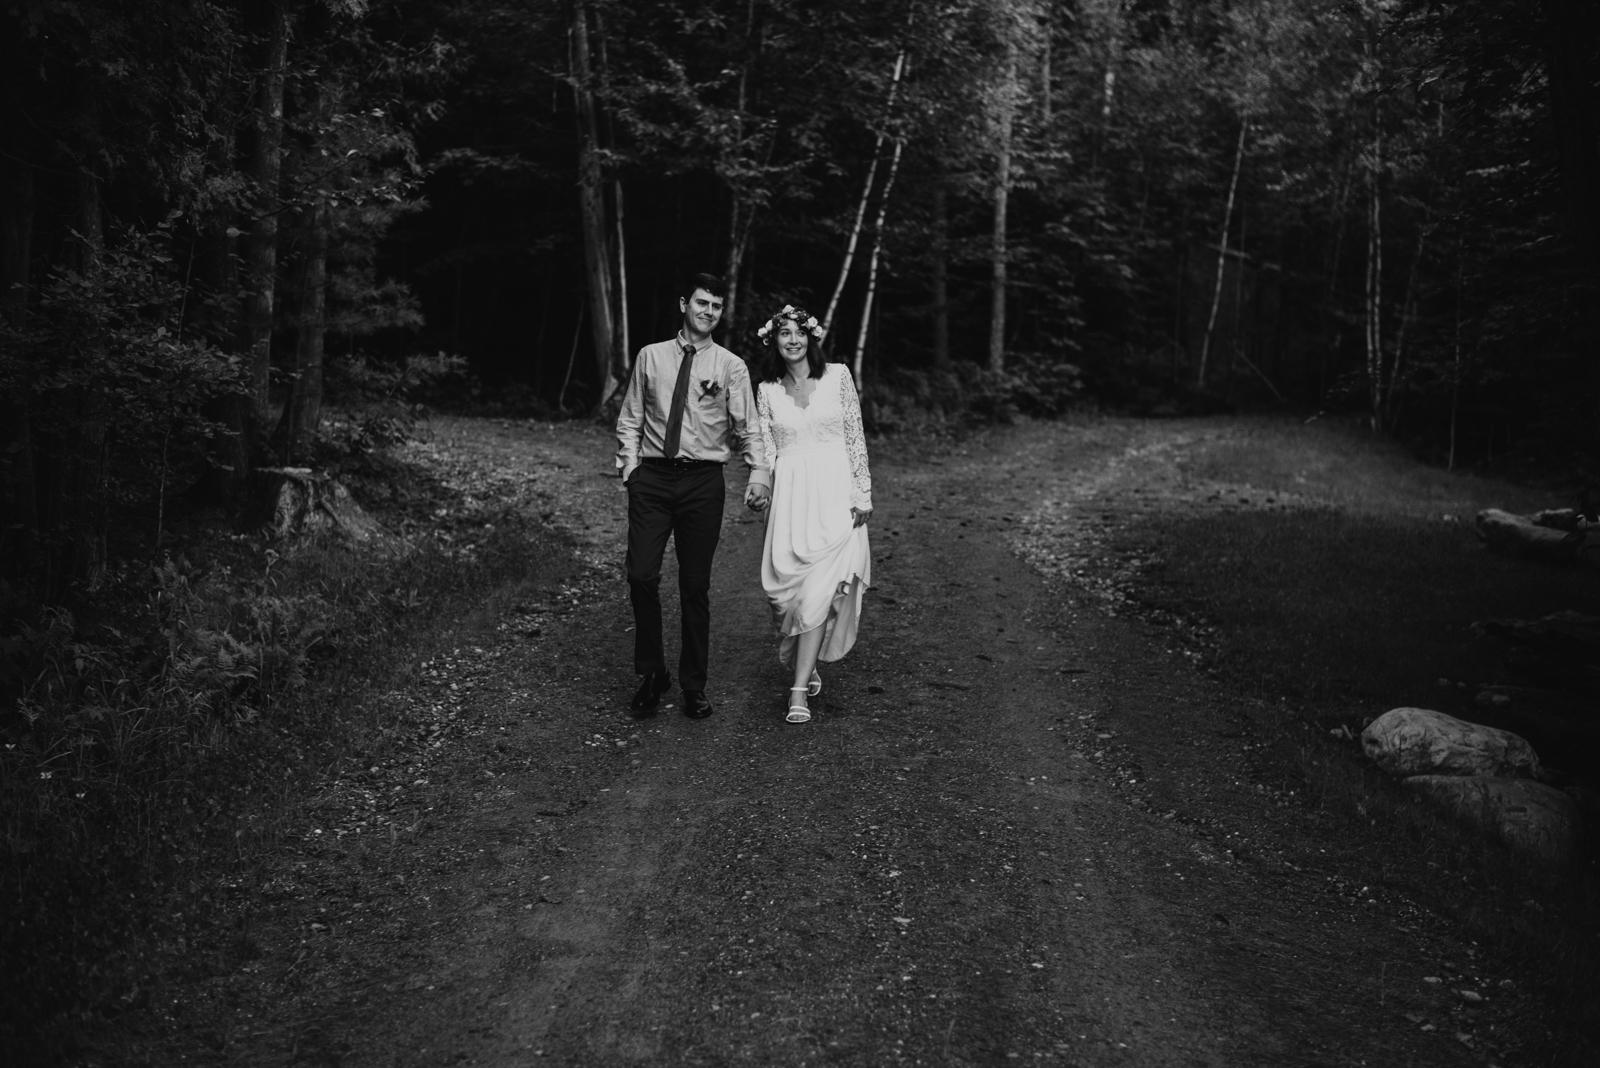 08192018-JessicaJordan-JuliaLuckettPhotography-287.jpg